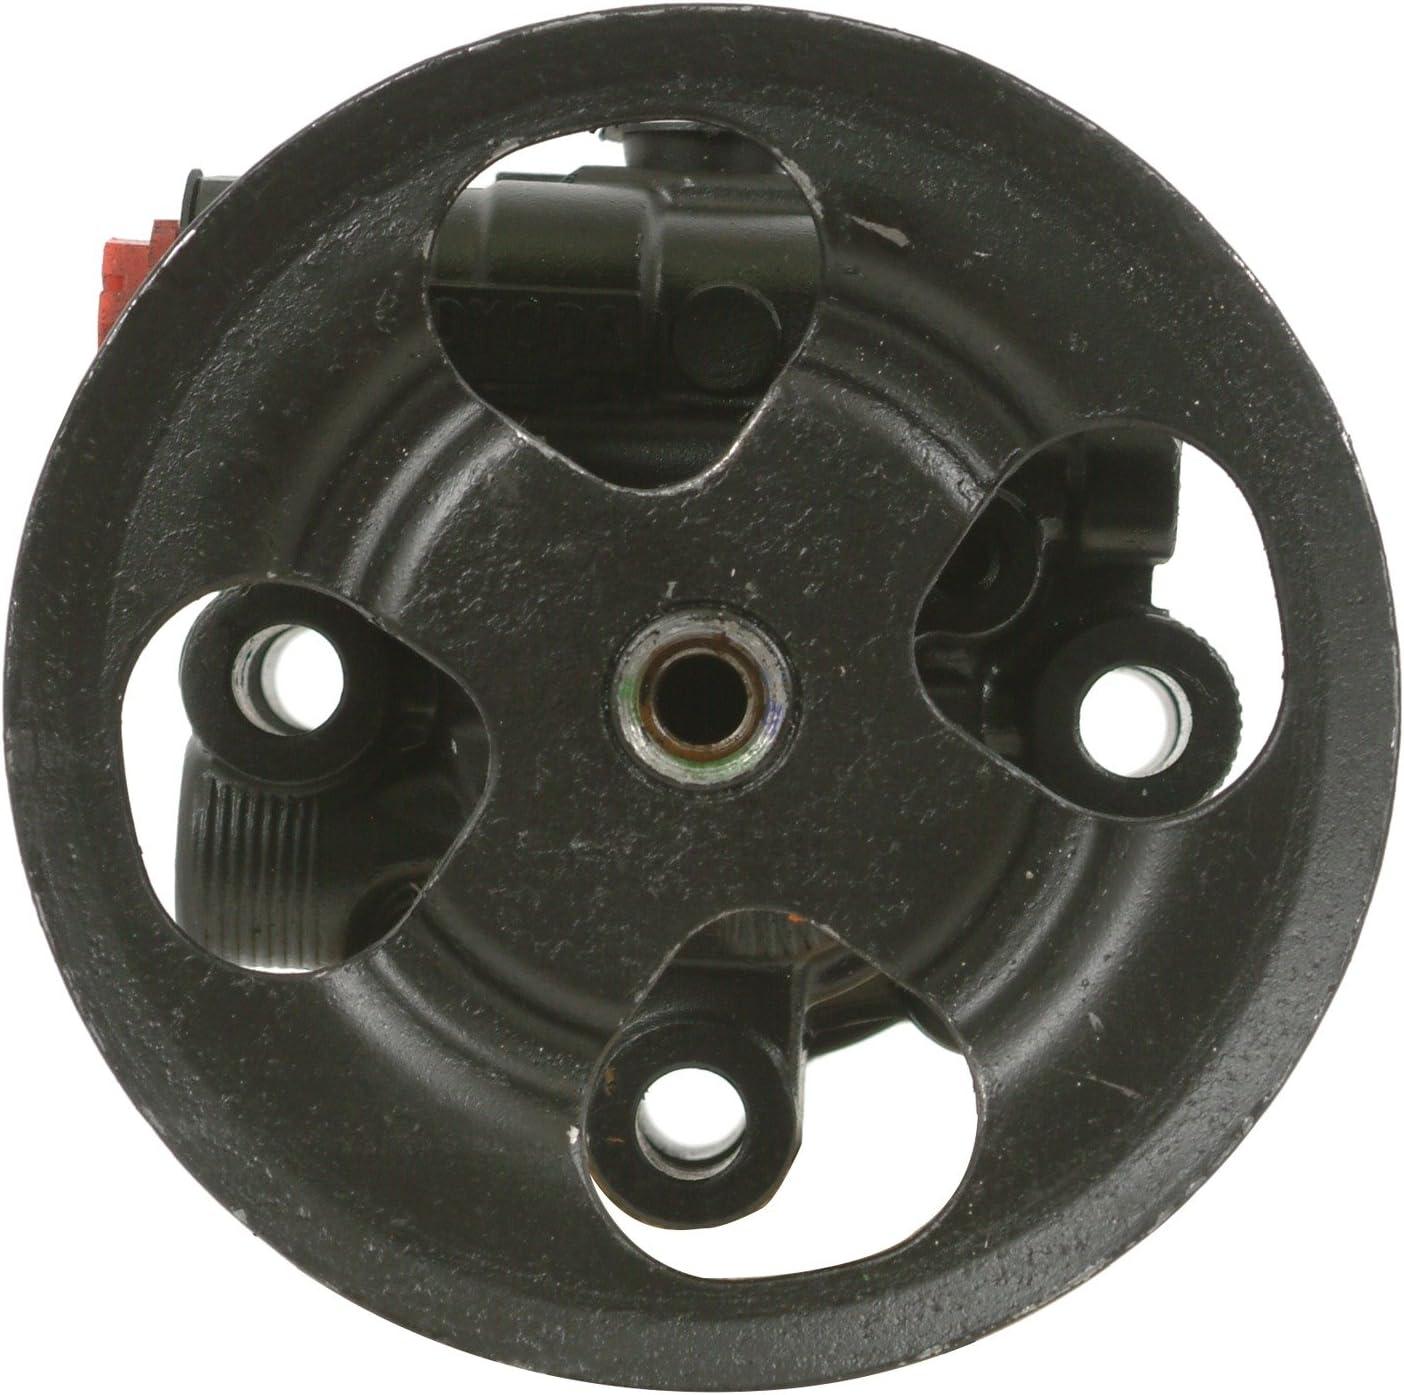 Cardone 21-5351 Remanufactured Import Power Steering Pump